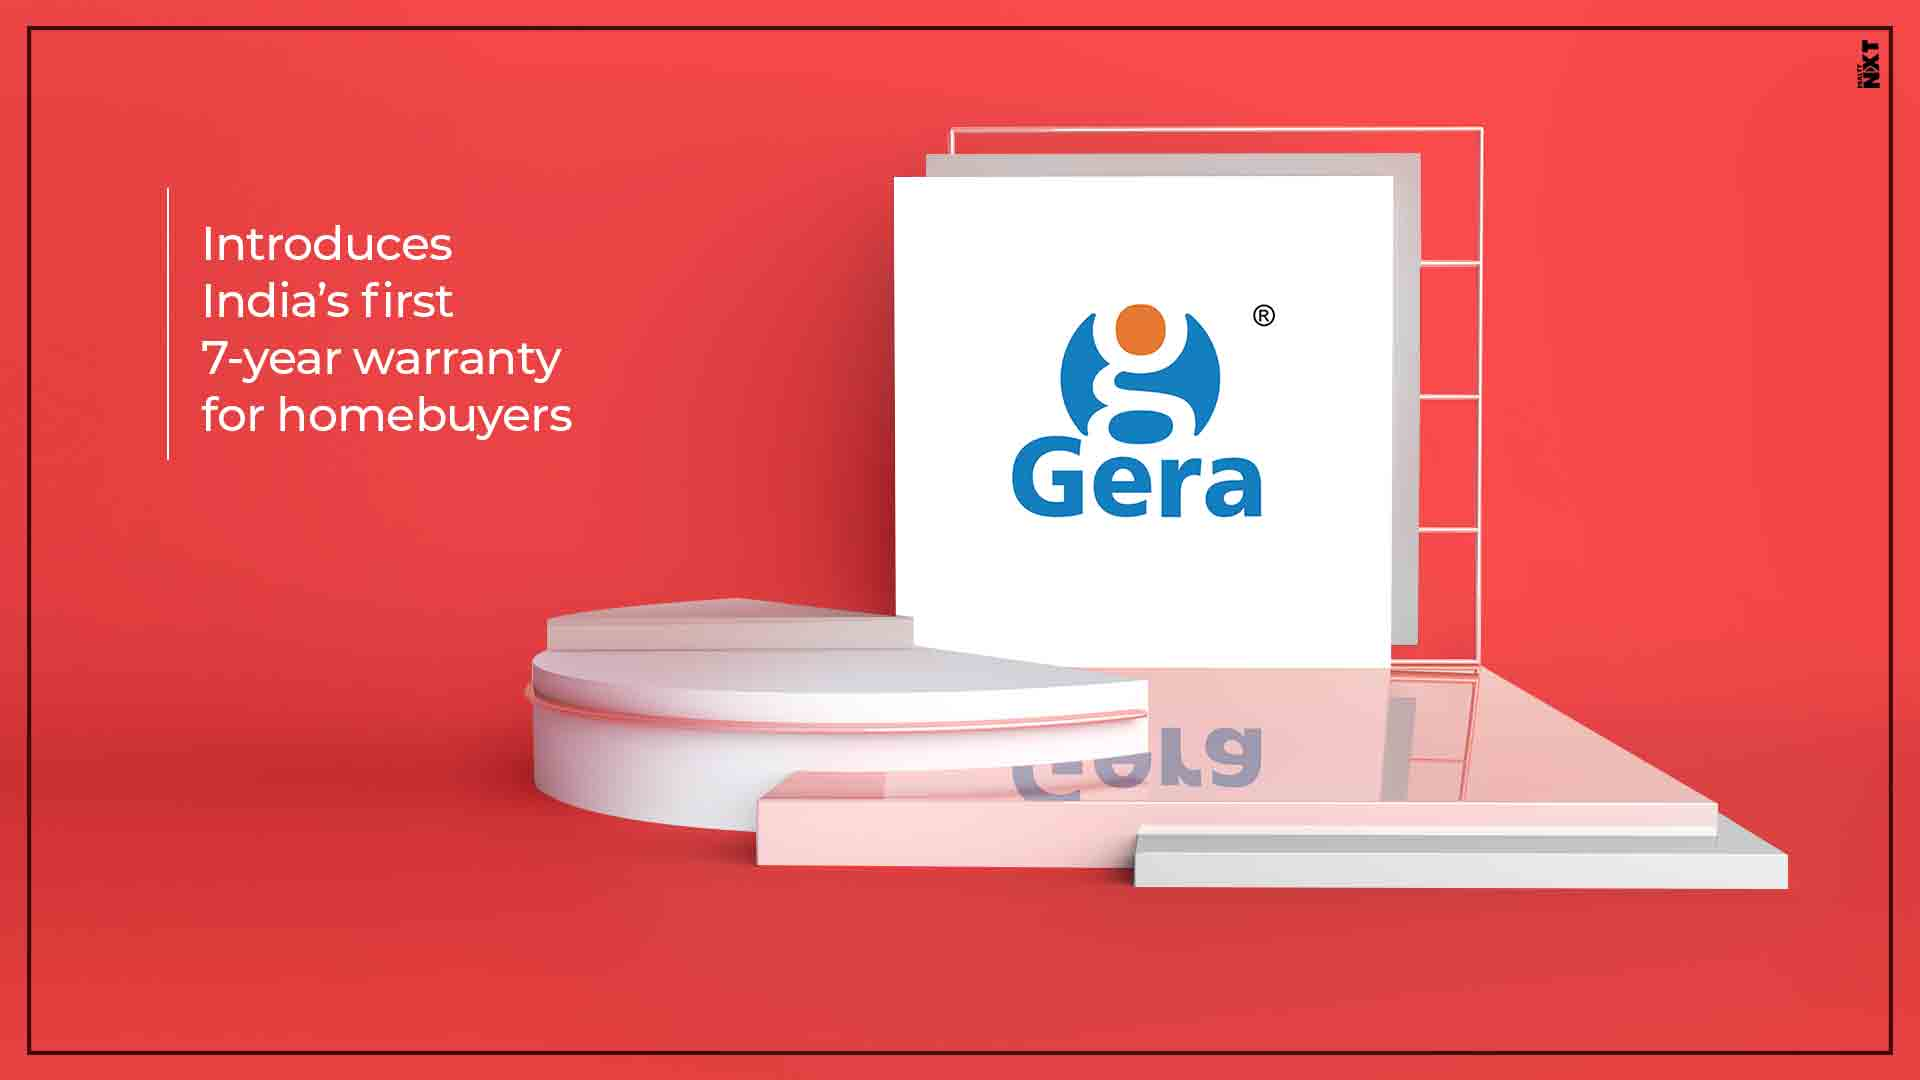 Gera development